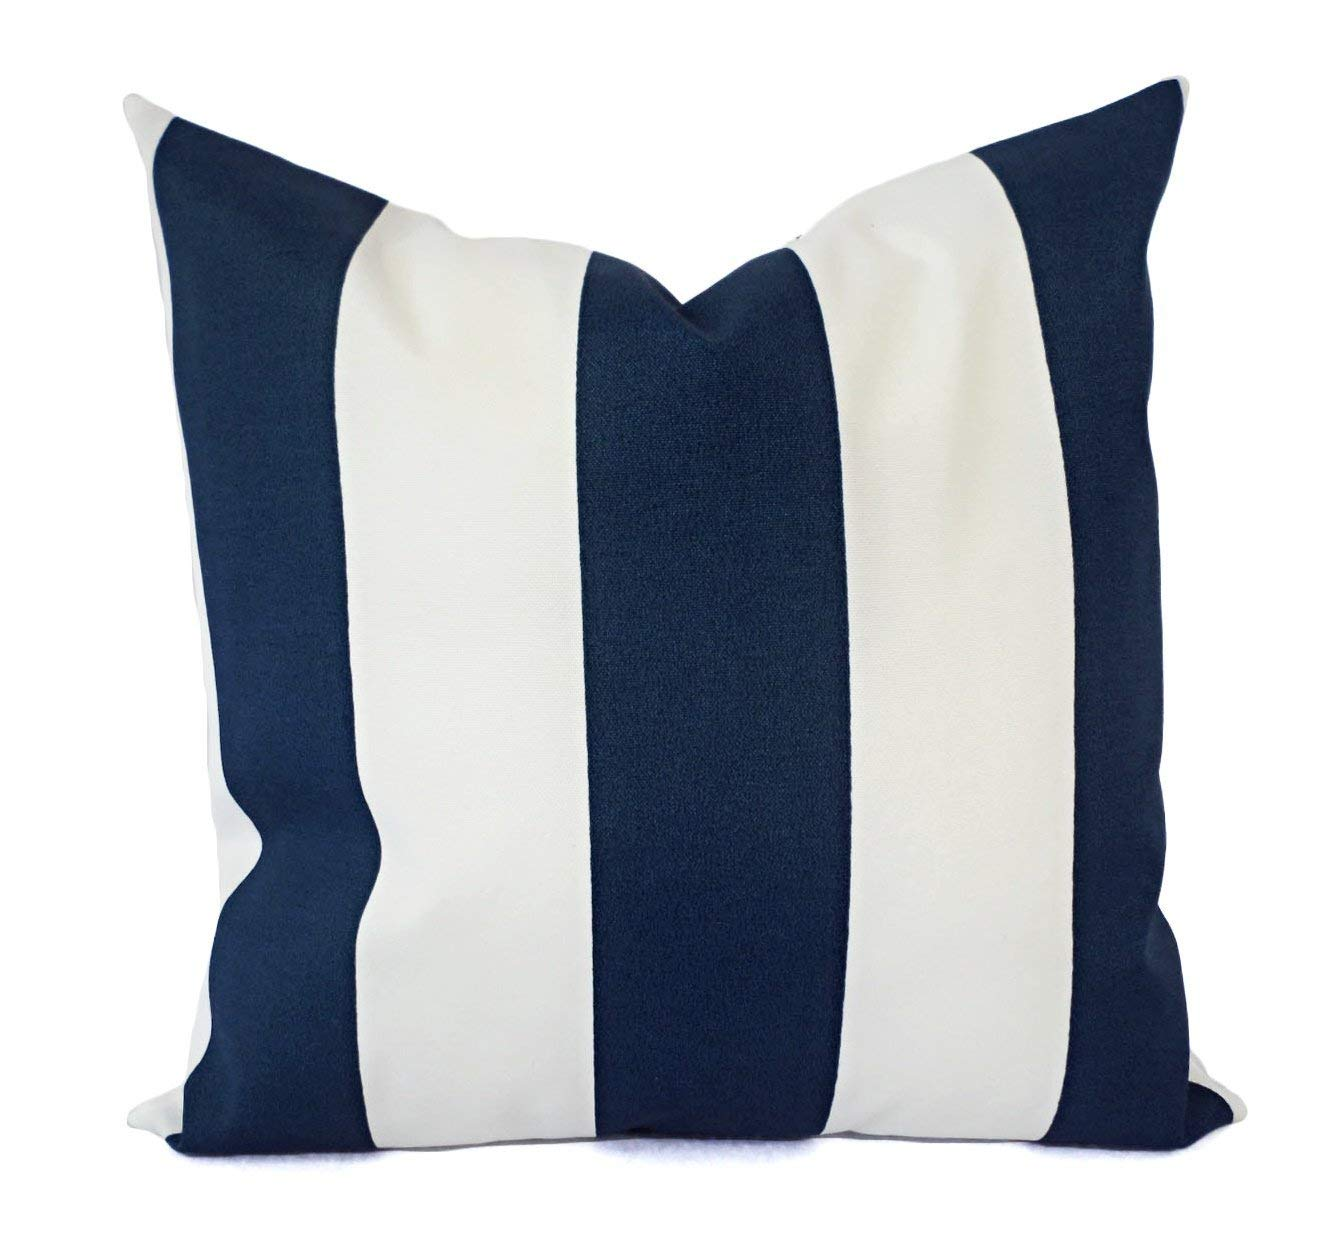 Outdoor Pillow Cover   Navy Pillow Shams   Blue Pillow Covers   Striped  Outdoor Pillow Cases   Decorative Pillows   Accent Pillows